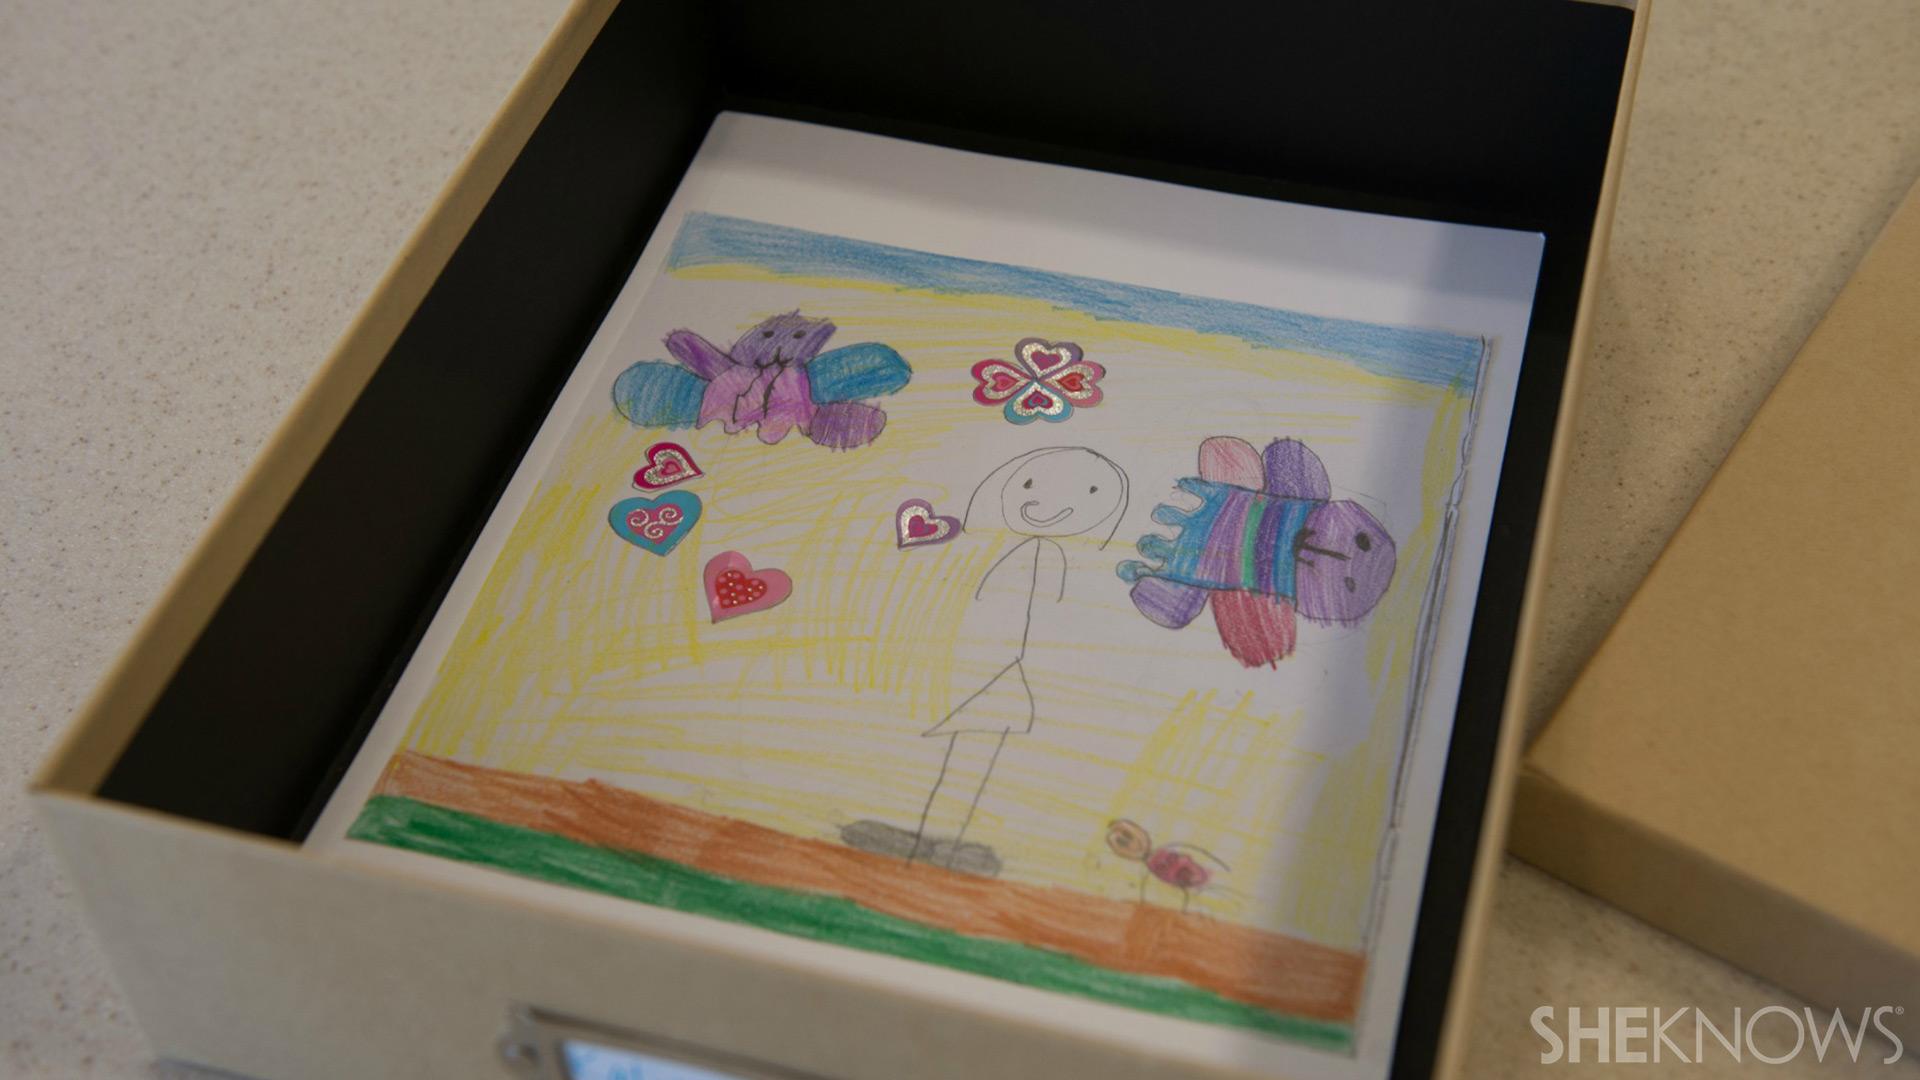 School project storage box | Sheknows.com - attach artwork